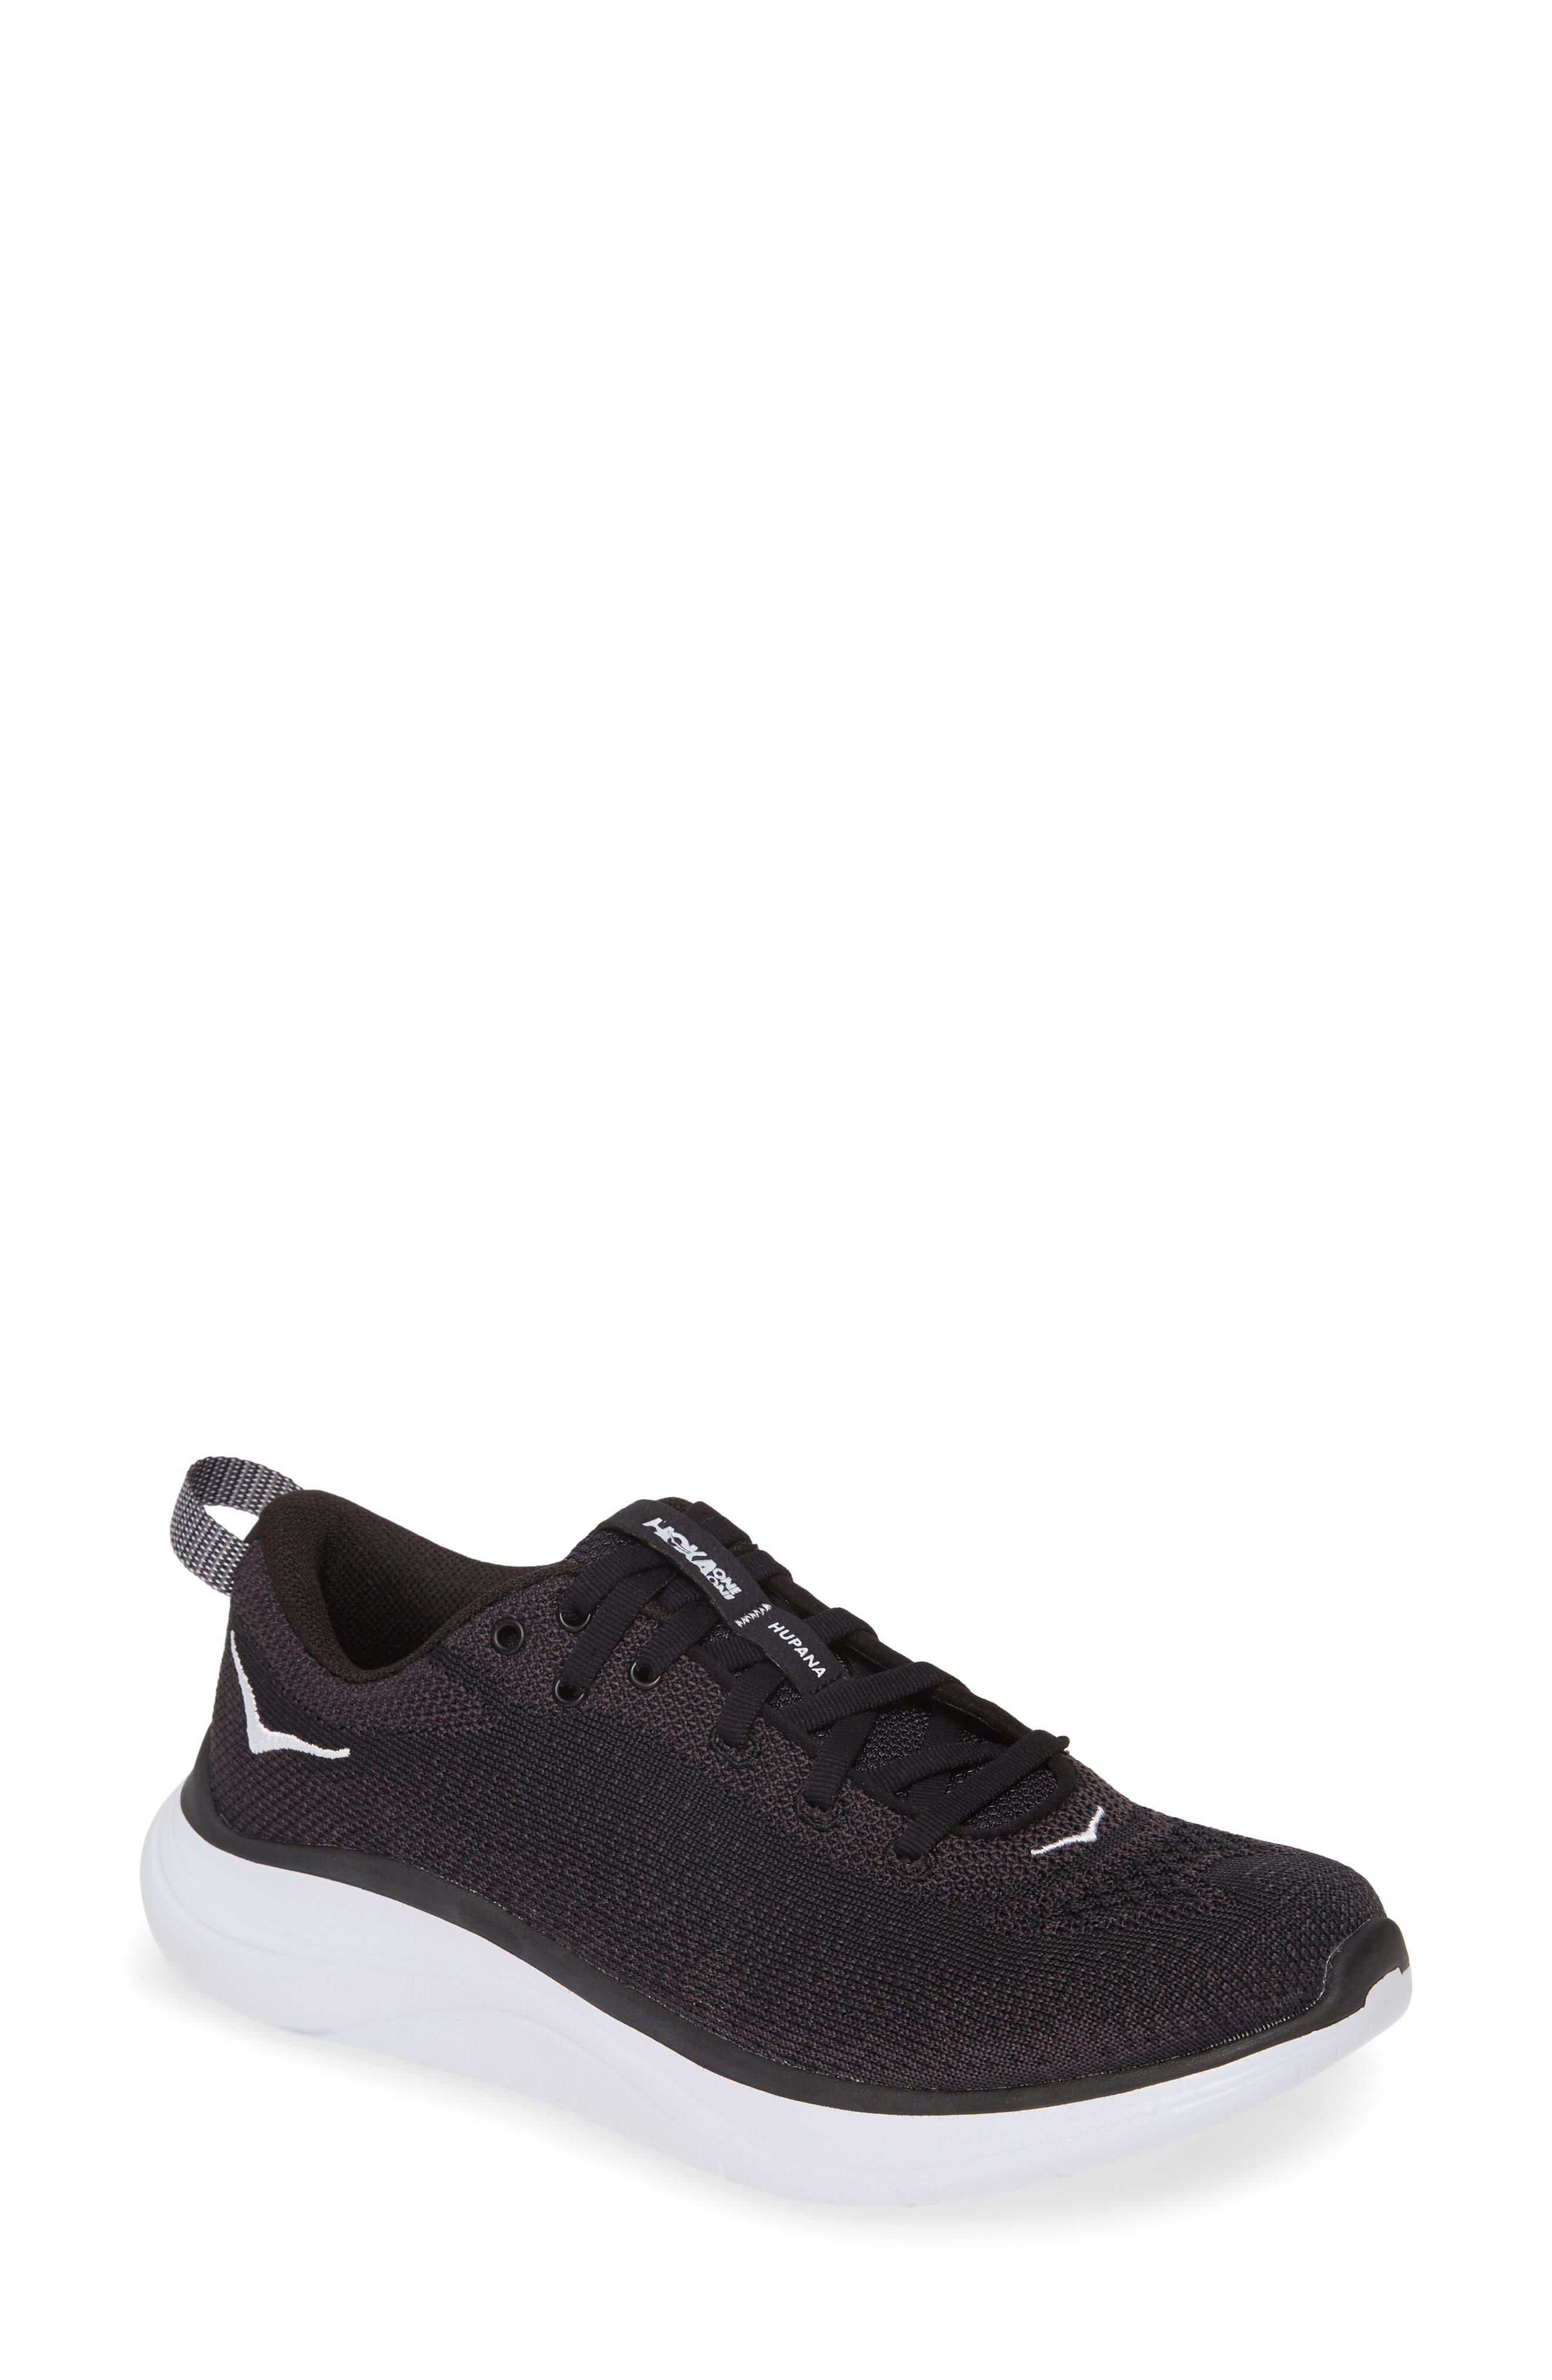 Hupana Flow Athletic Shoe